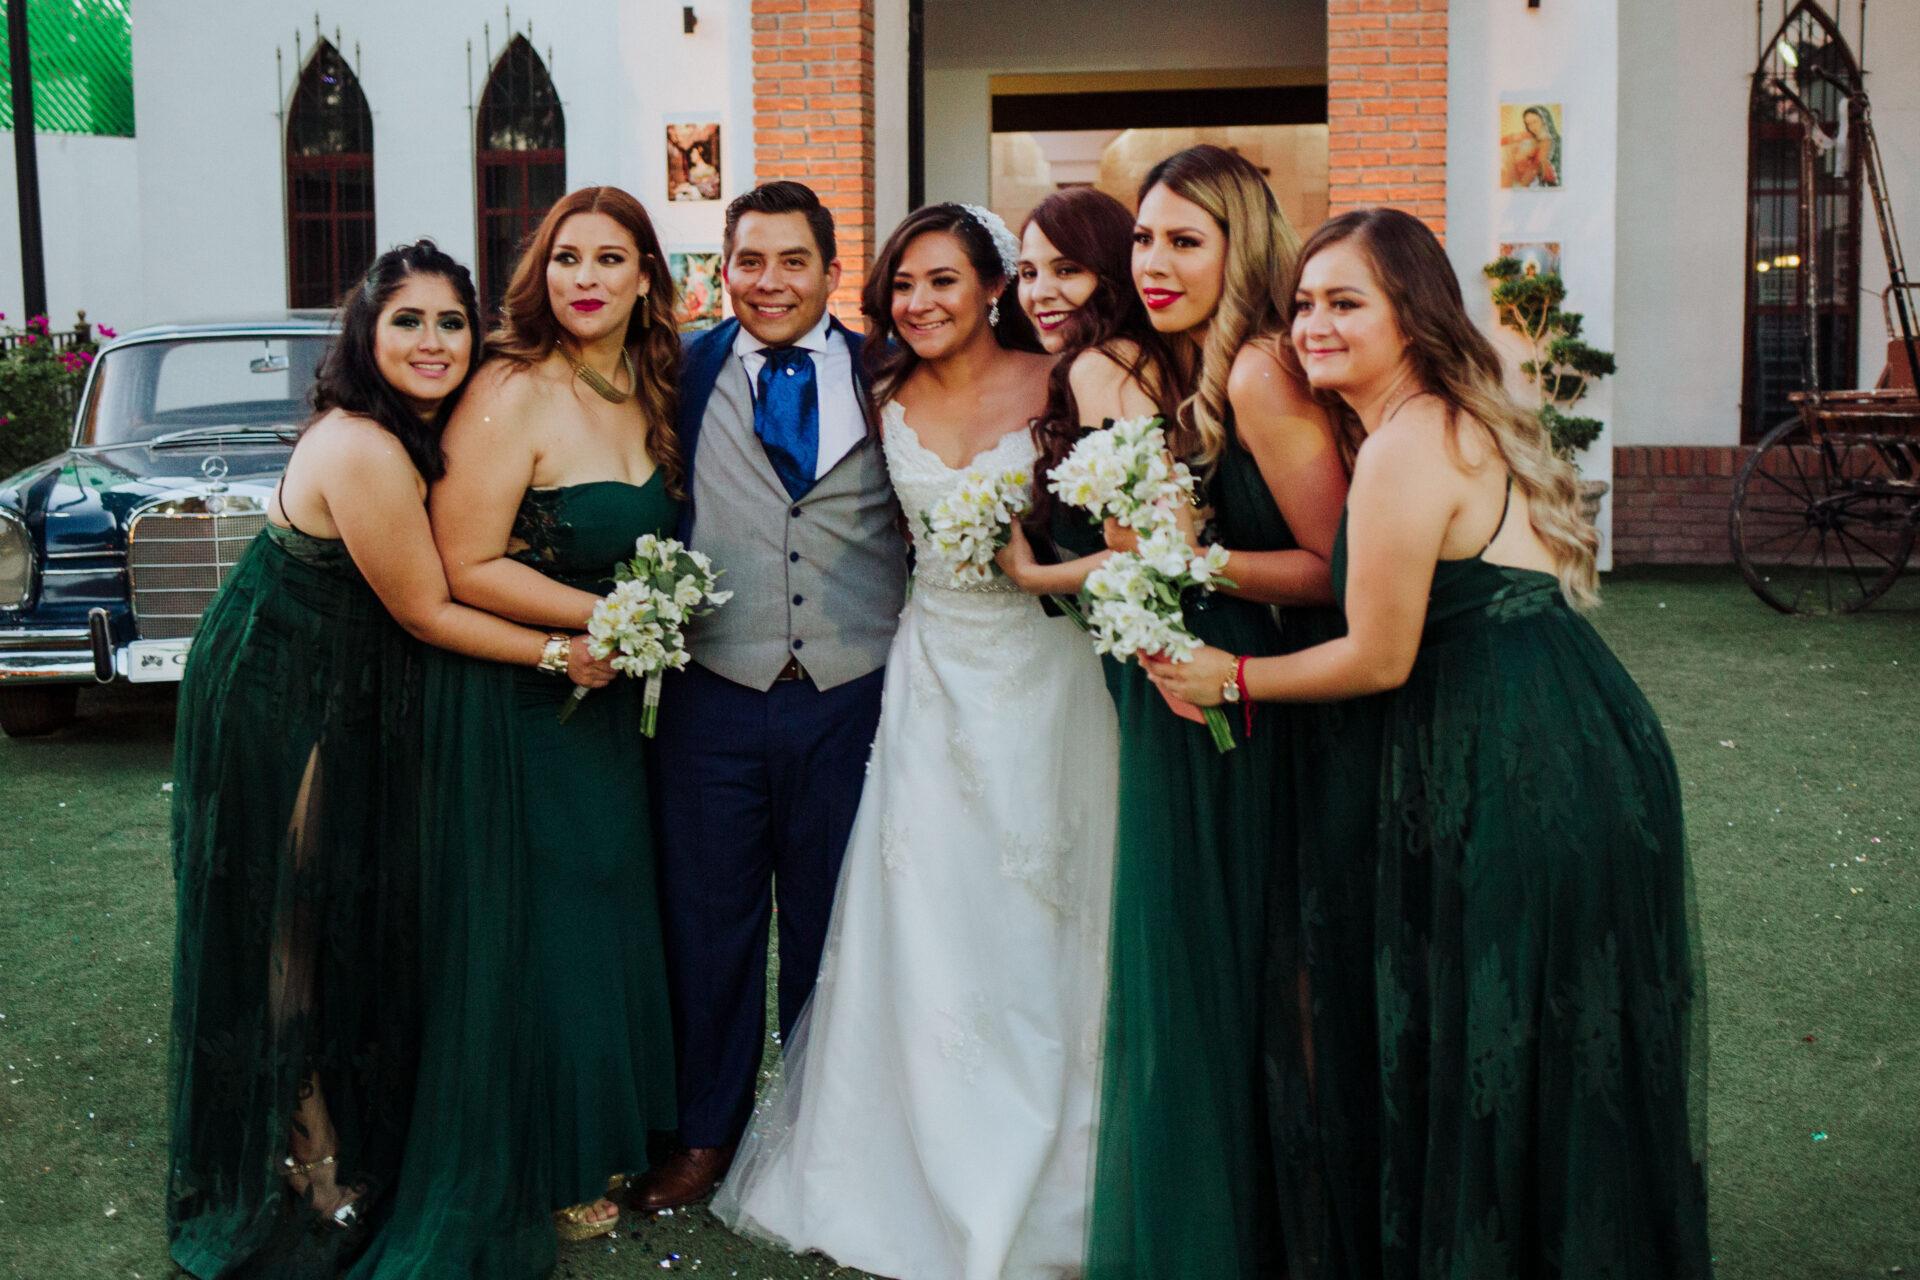 javier_noriega_fotografo_bodas_torreon_coahuila_zacatecas_wedding_photographer49a